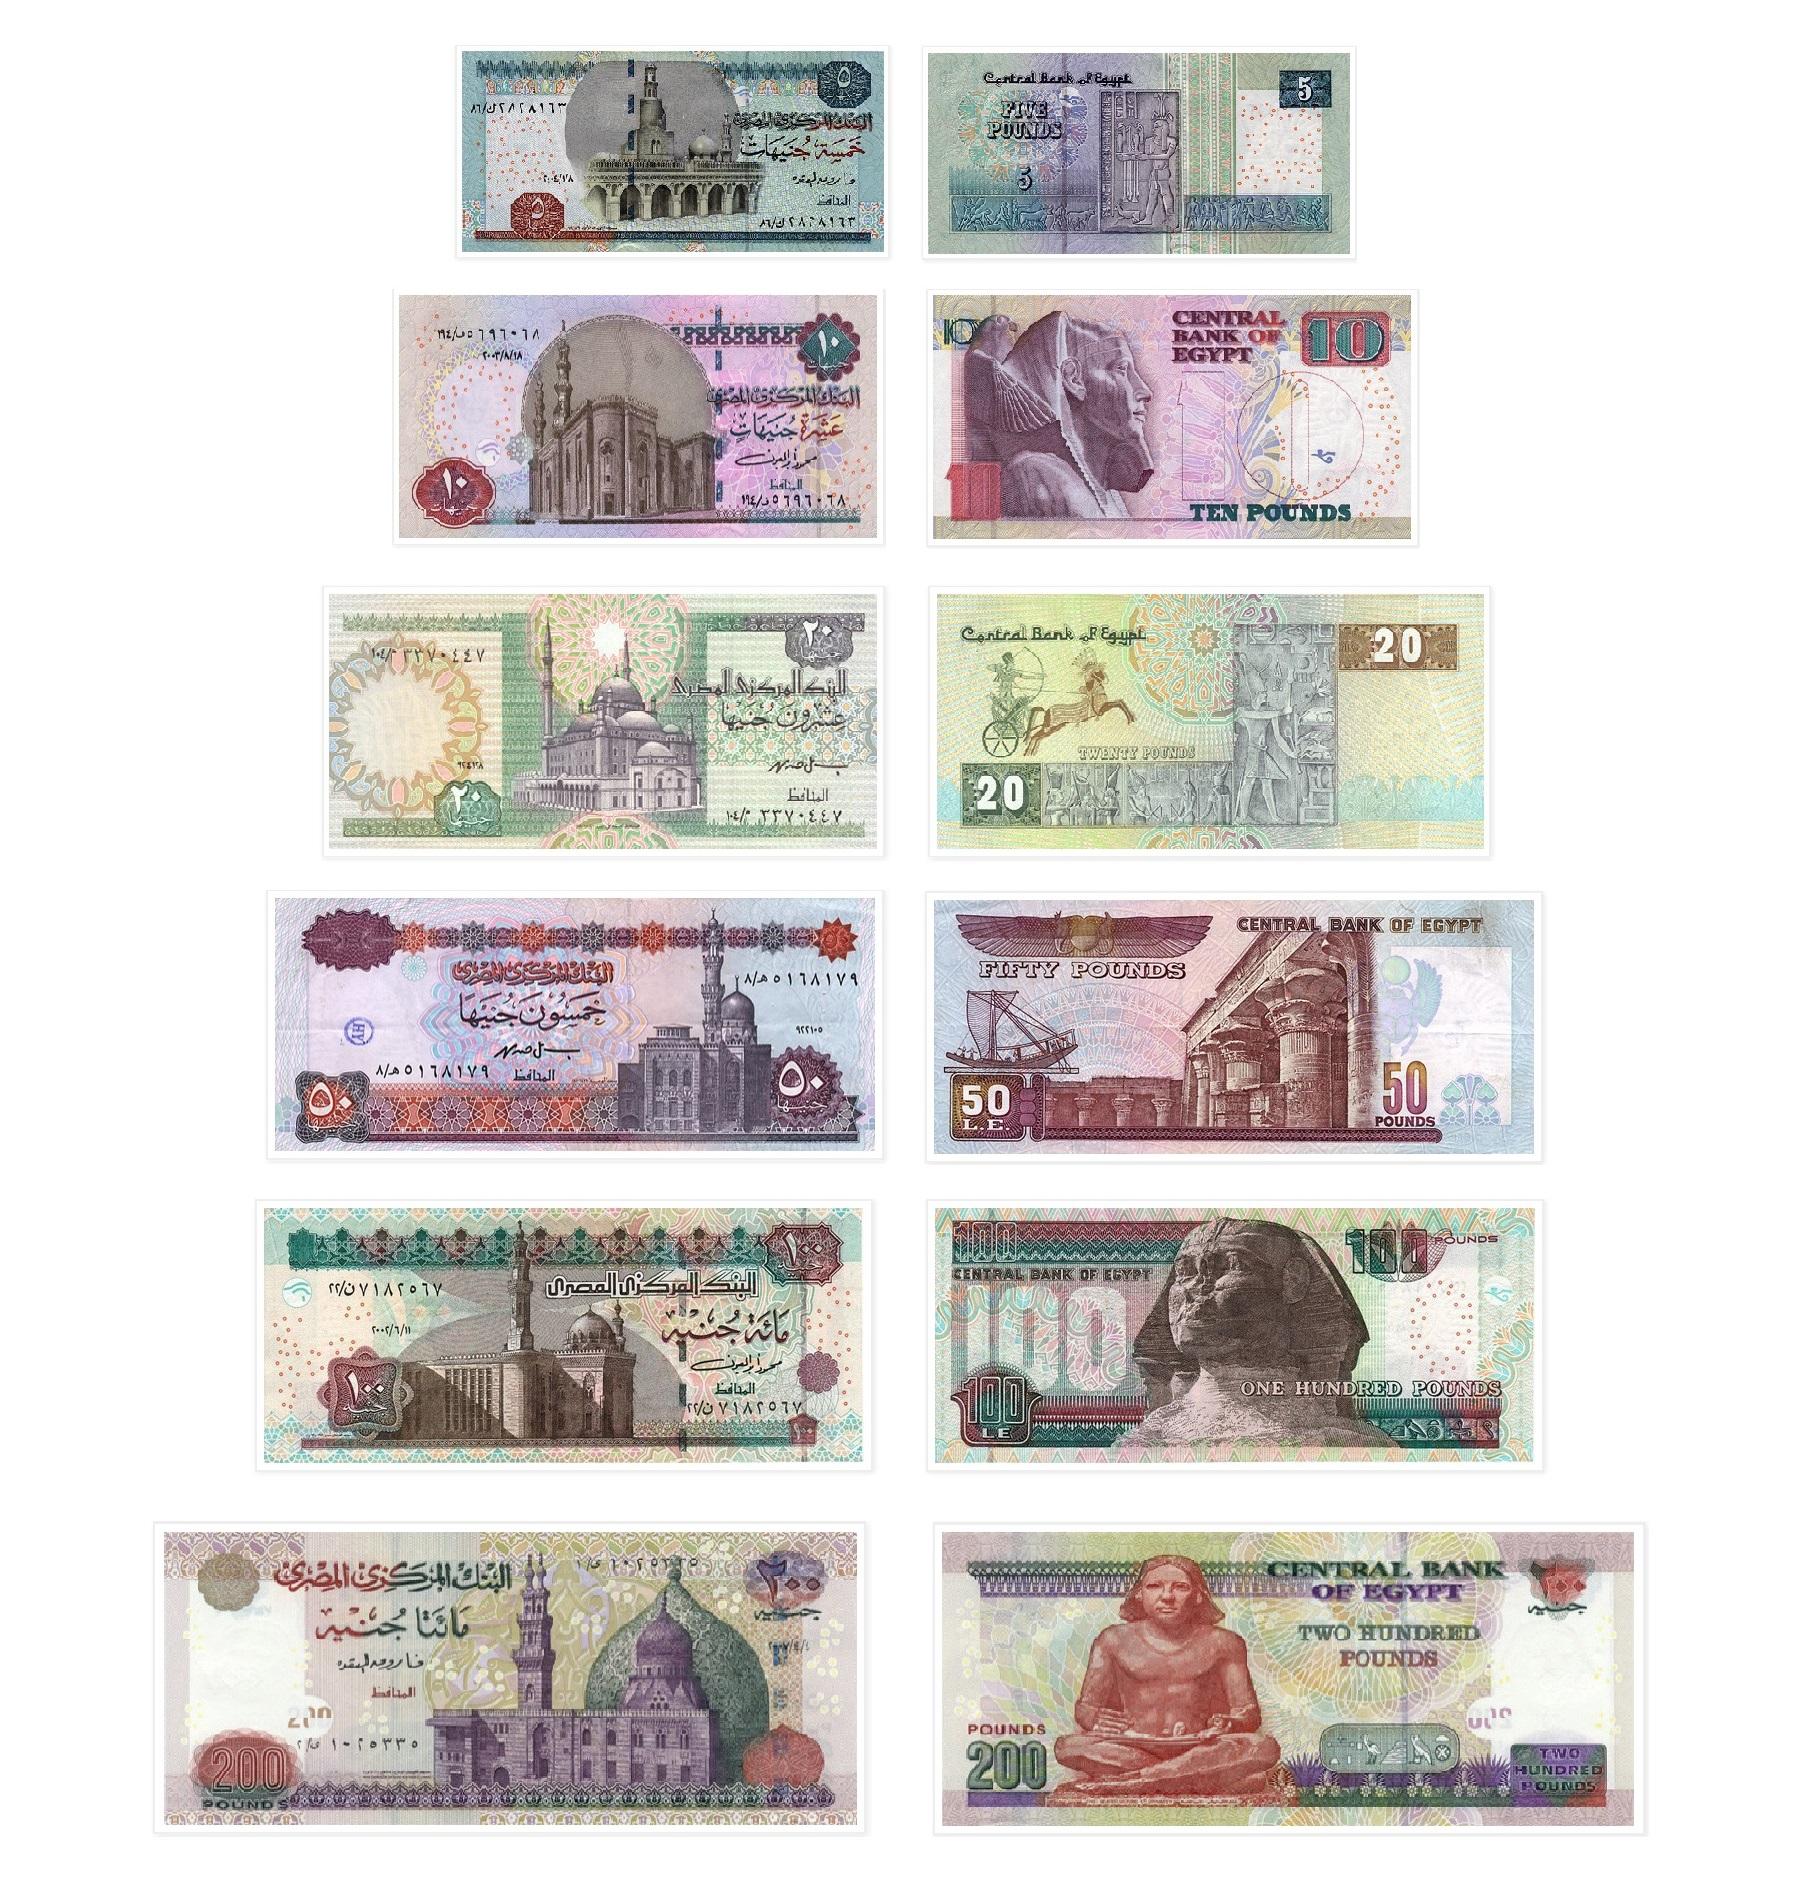 نتيجة بحث الصور عن photos of 10 and 20 egyptian pounds